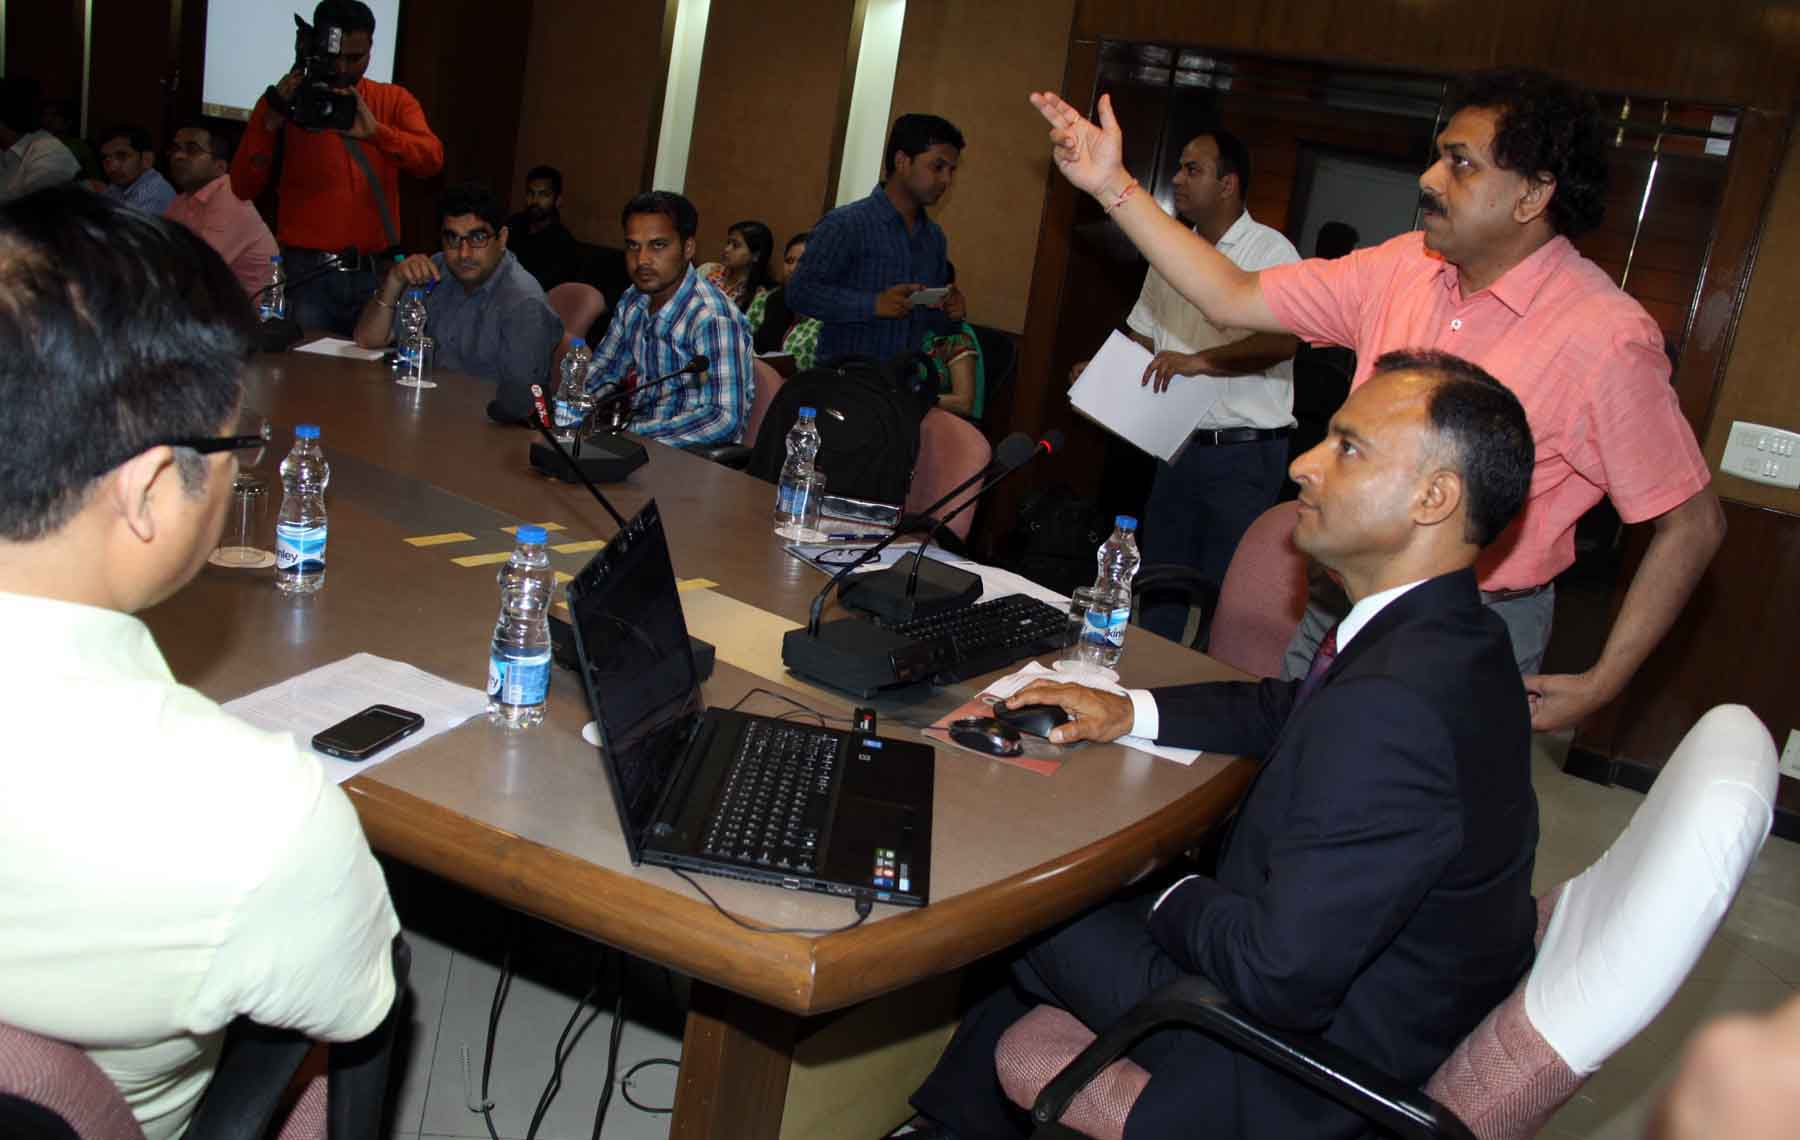 The Adviser to the Administrator, UT, Chandigarh, Mr. Vijay Dev launching the Women Employment Web-Portal www.mahilarozgar.com at UT State Guest House, Chandigarh on Tuesday, March 31, 2015.